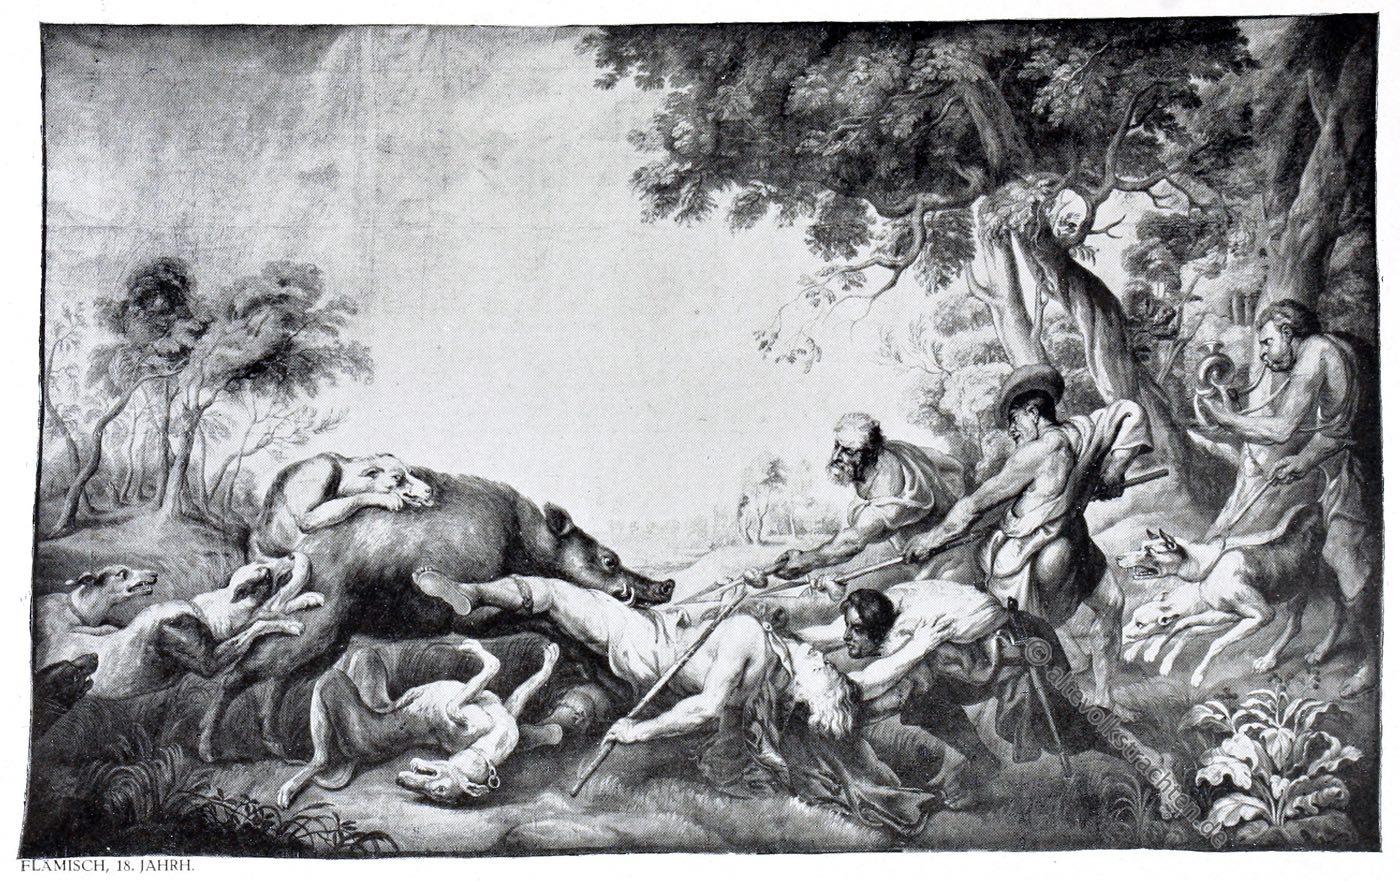 Gobelin, Barock, Eberjagd, Kunsthistorie, Gobelinsammlung, Flämisch, Gobelins, 17. Jahrhundert,